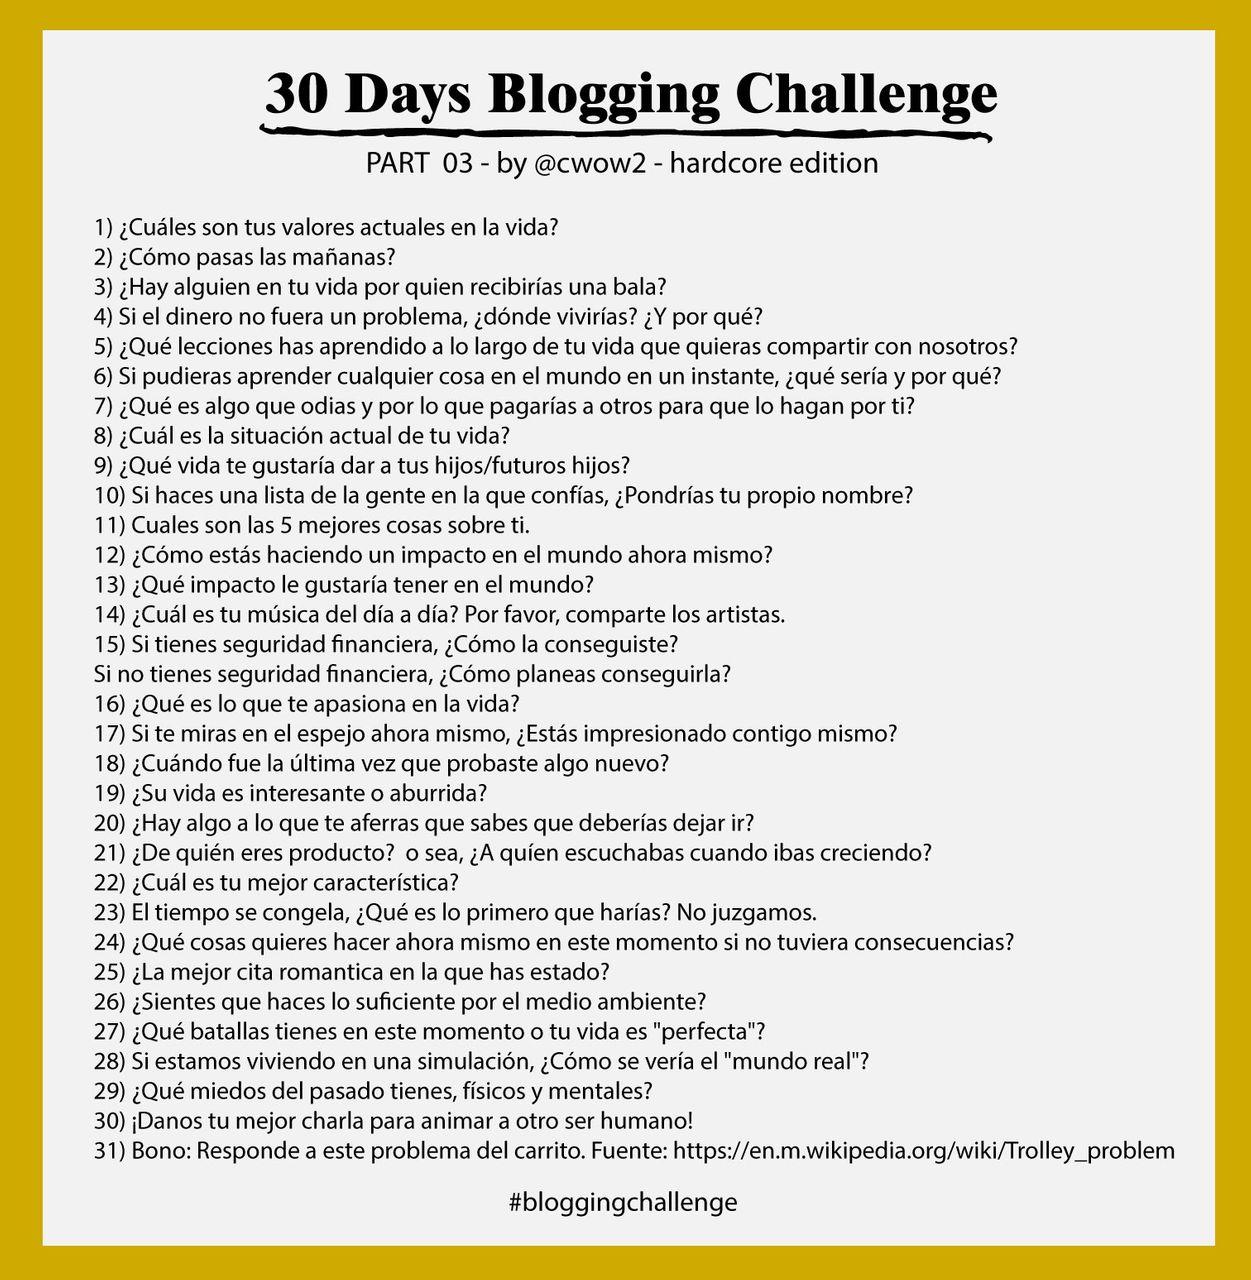 bloggingchallengepart03.0espanol 1.jpg